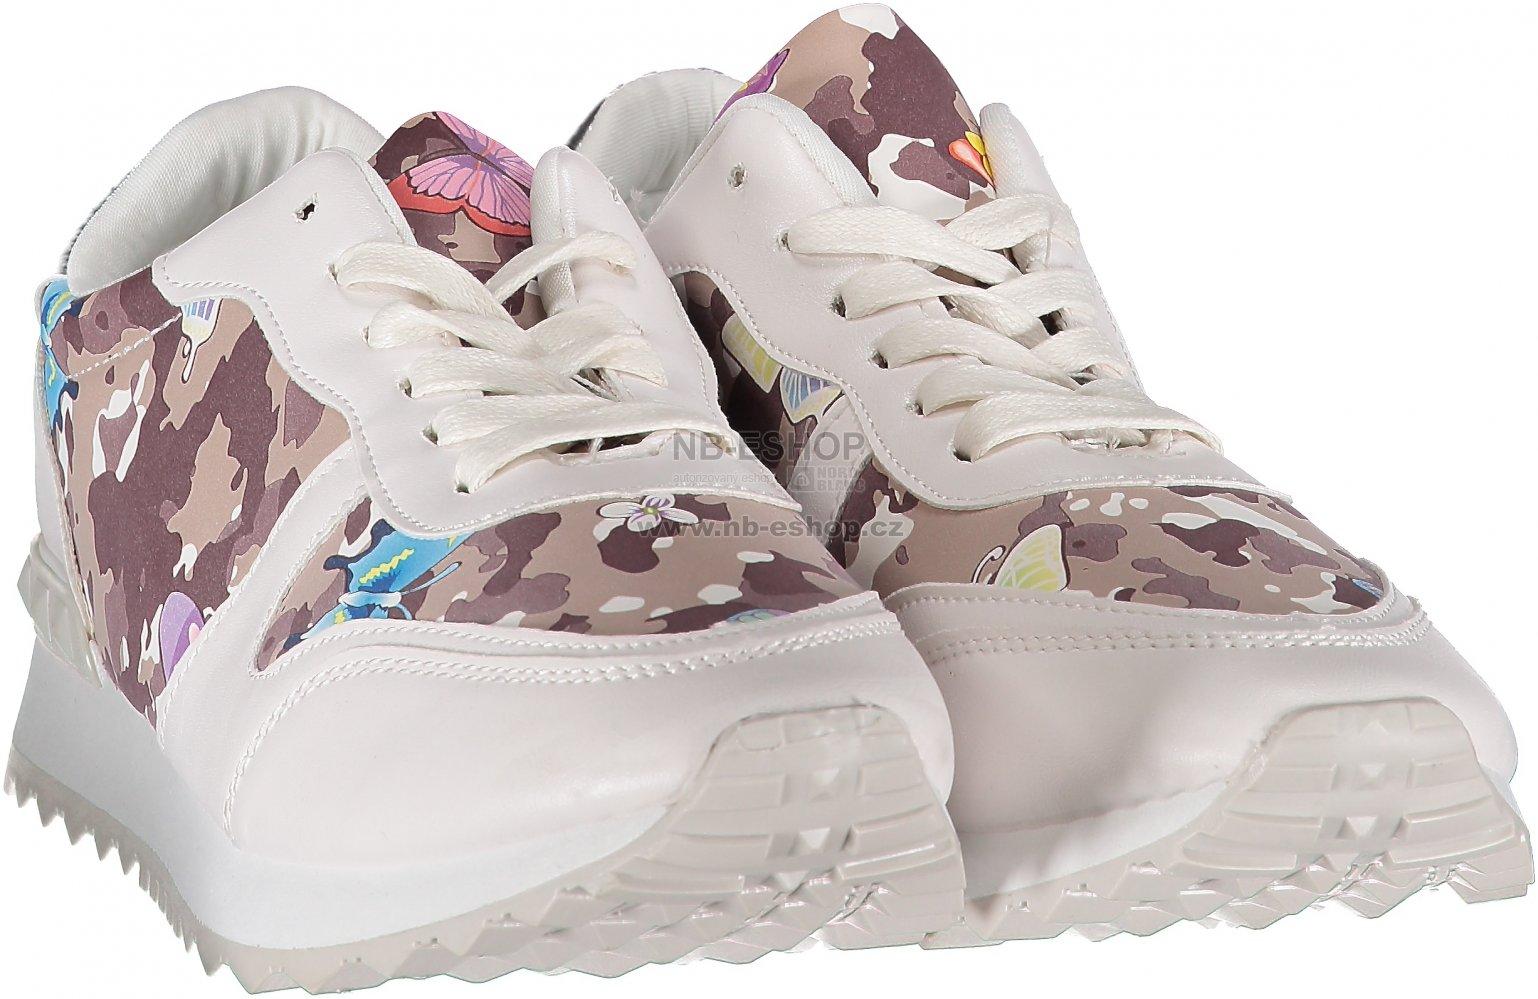 Dámské boty VICES 8371-41 WHITE velikost  40   NB-ESHOP.cz e0ce8b9471